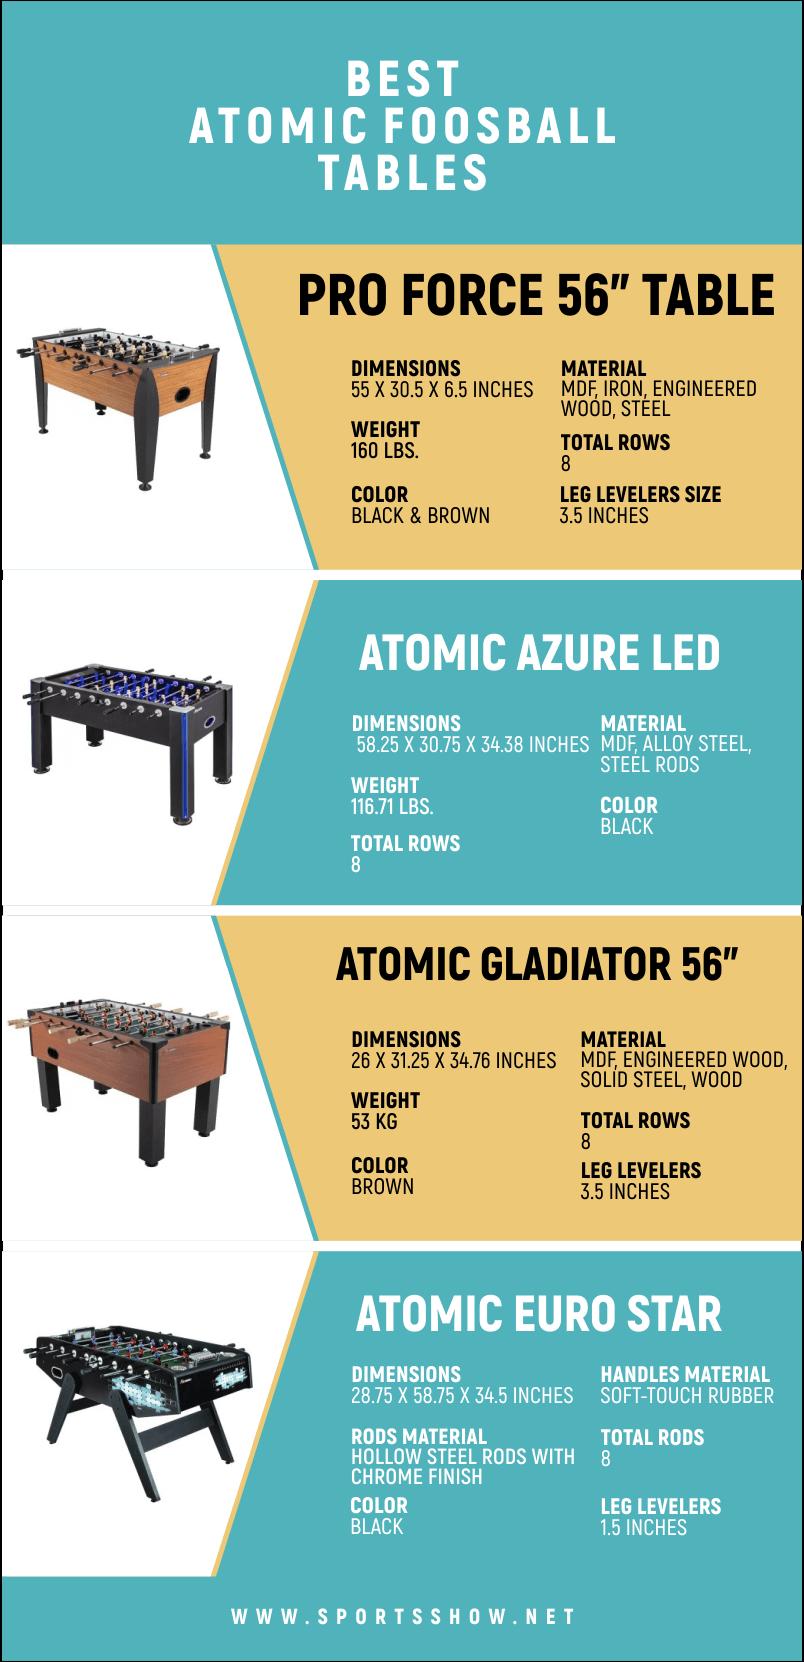 Best Atomic Foosball Tables